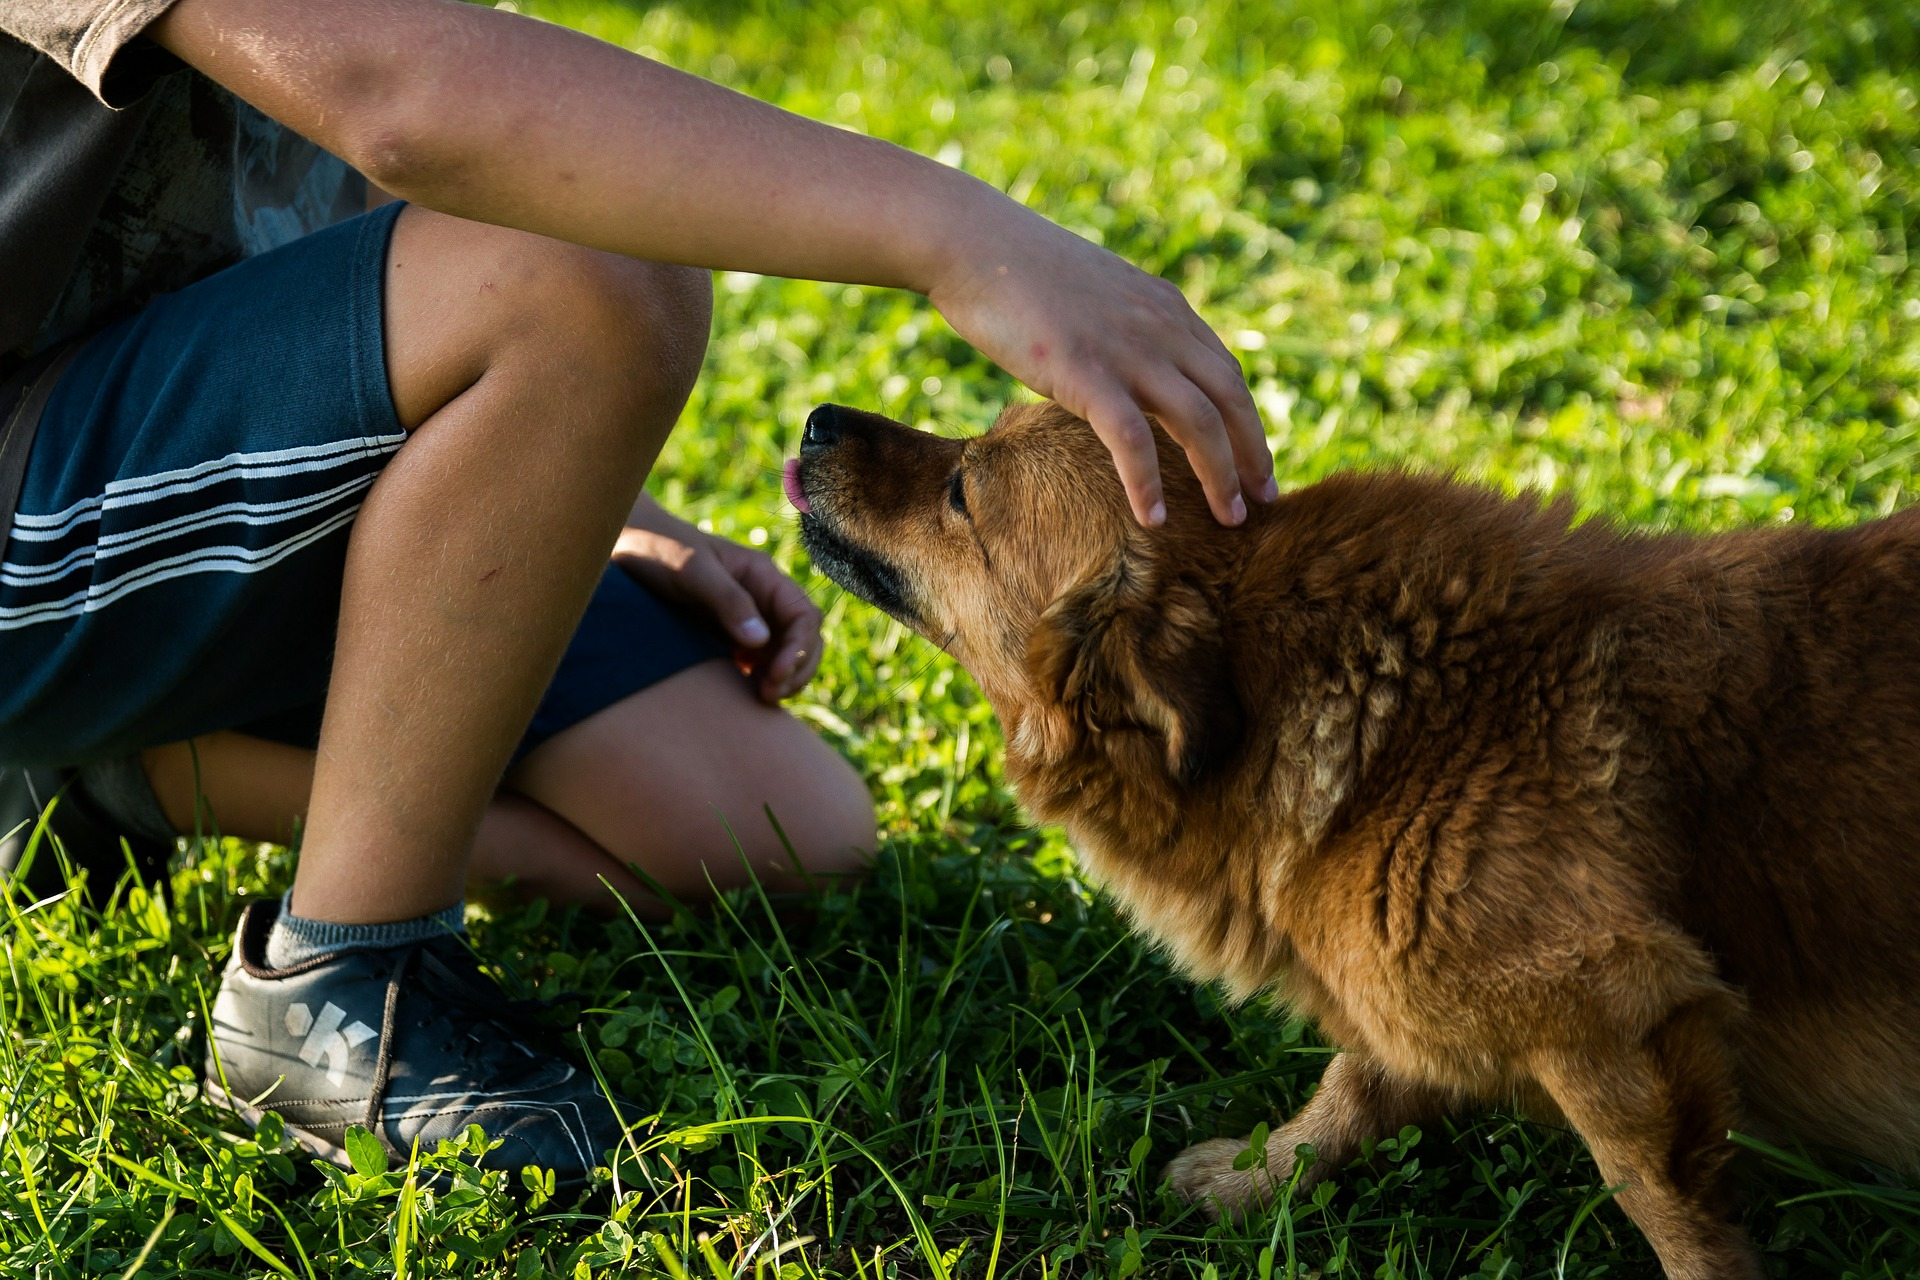 Junge streichelt Hund (Foto: Pixabay/jarmoluk)